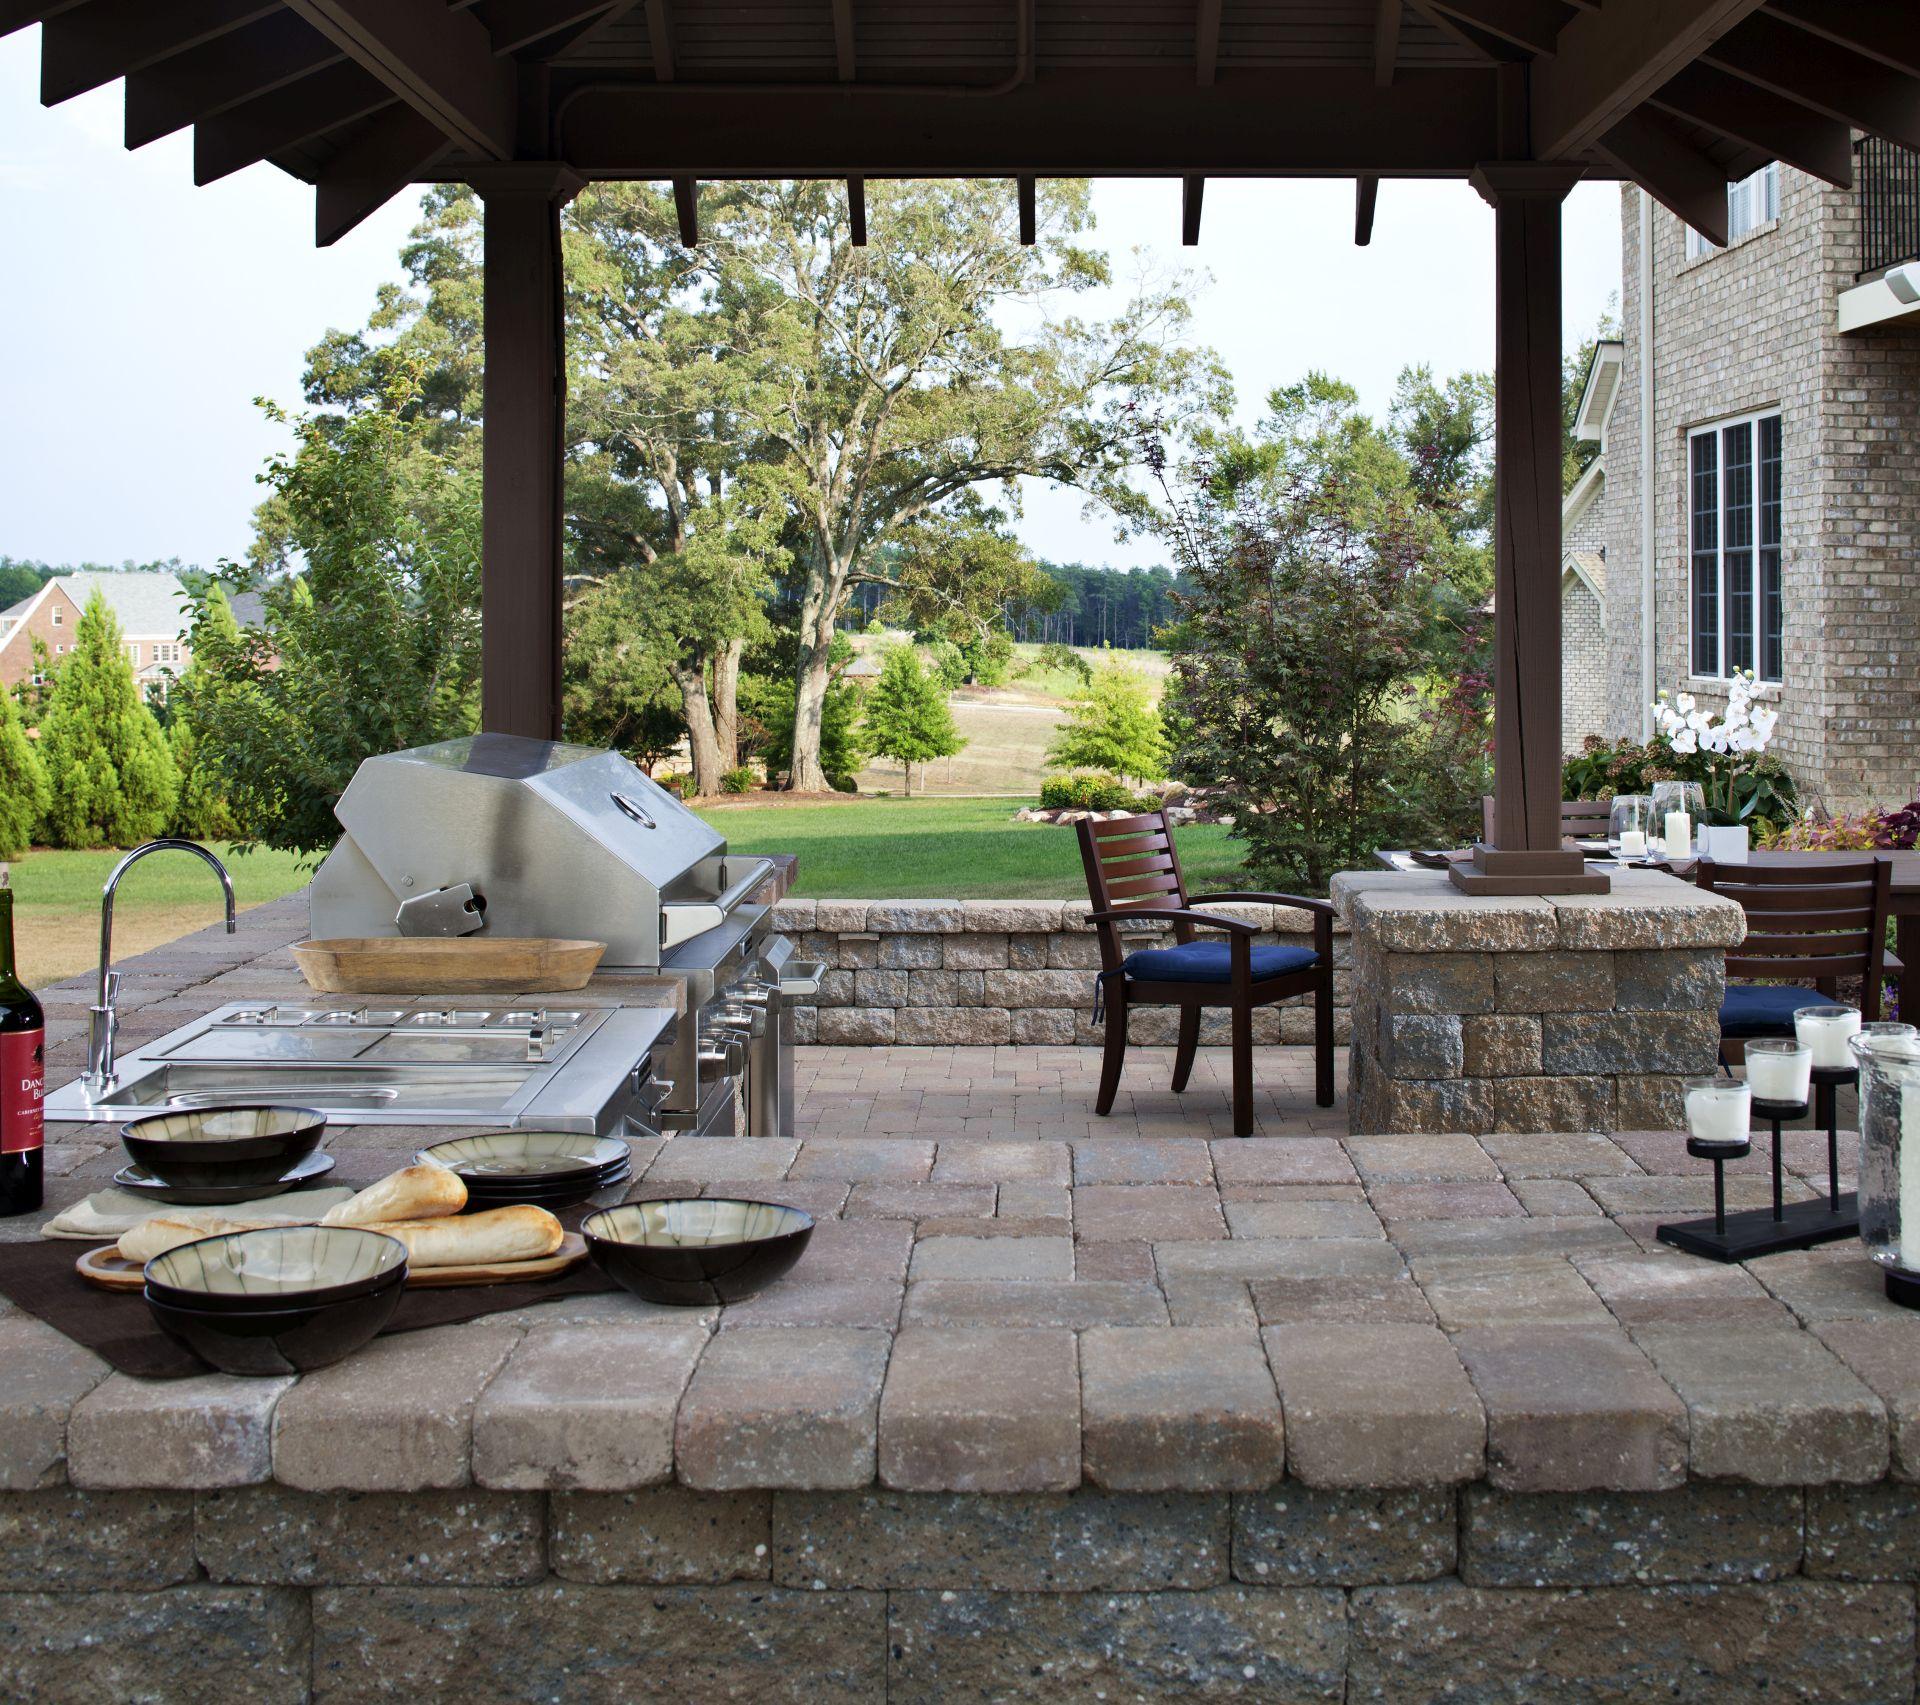 outdoor kitchen countertops ideas countertops for kitchens Outdoor Kitchen Countertop Ideas